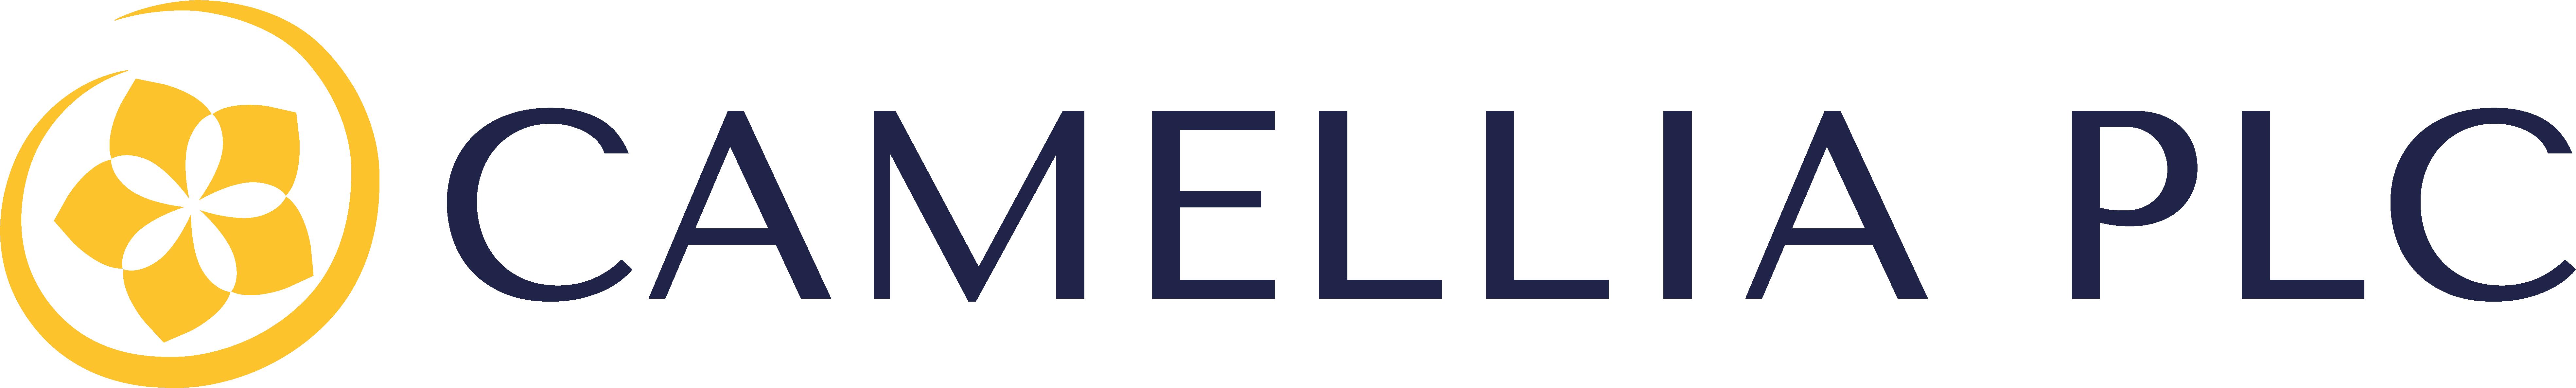 CAMELLIA PLC Logo